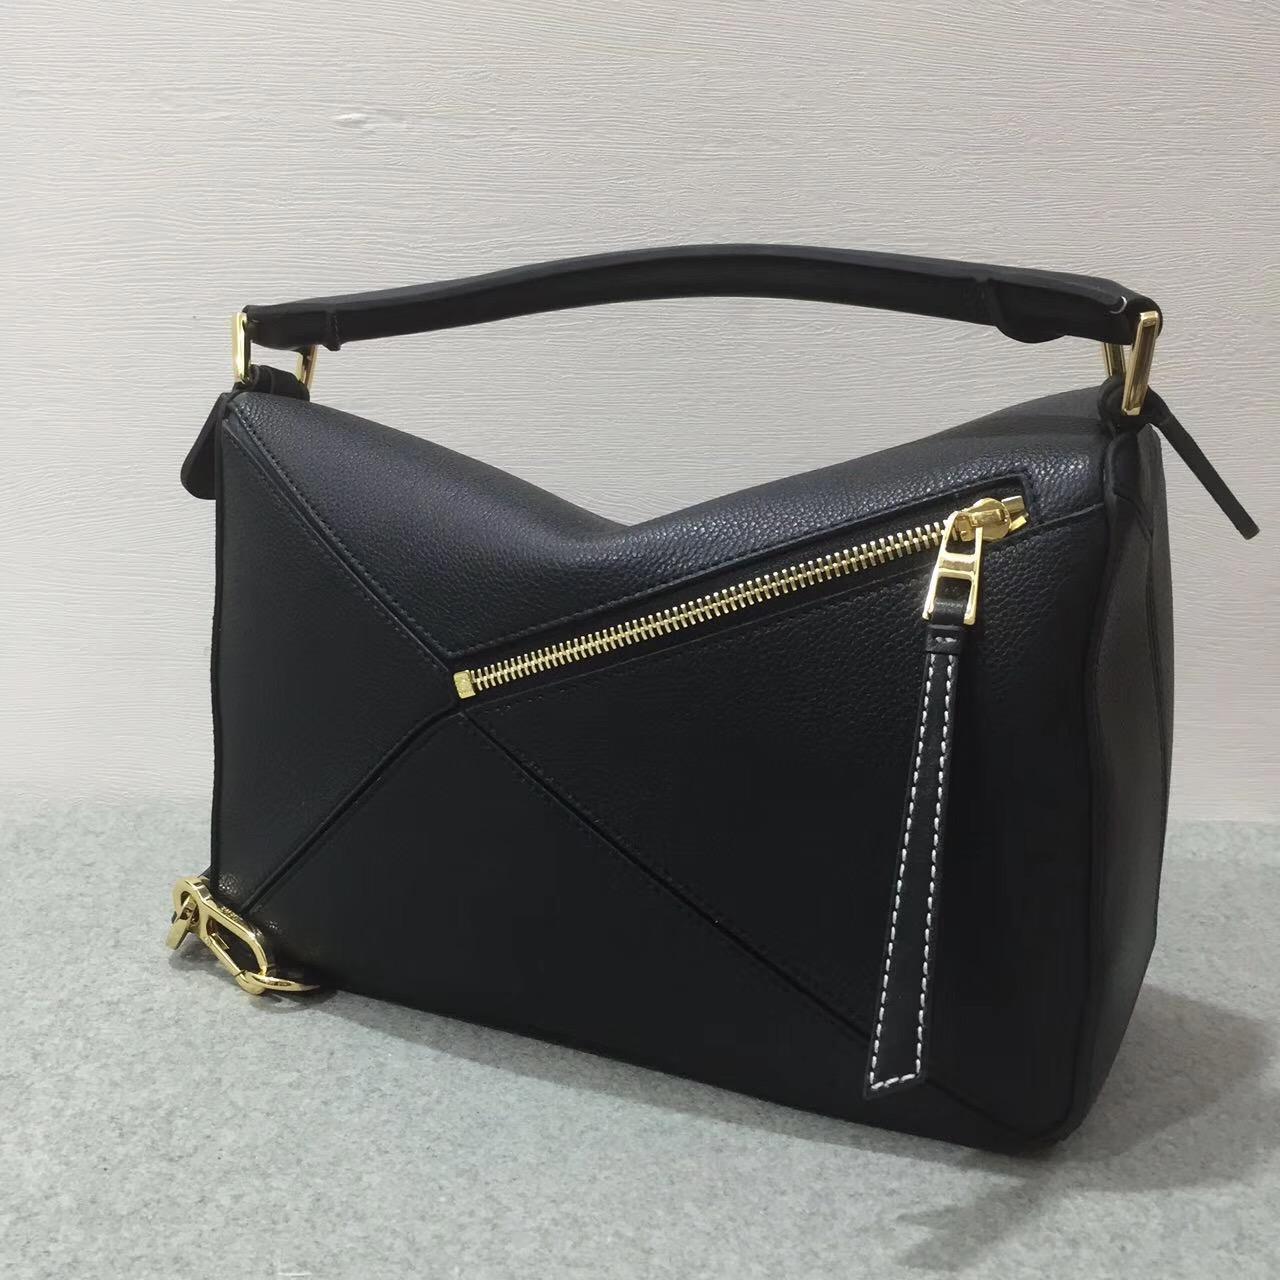 Loewe羅意威中號 Puzzle Bag 顆粒小牛皮黑色